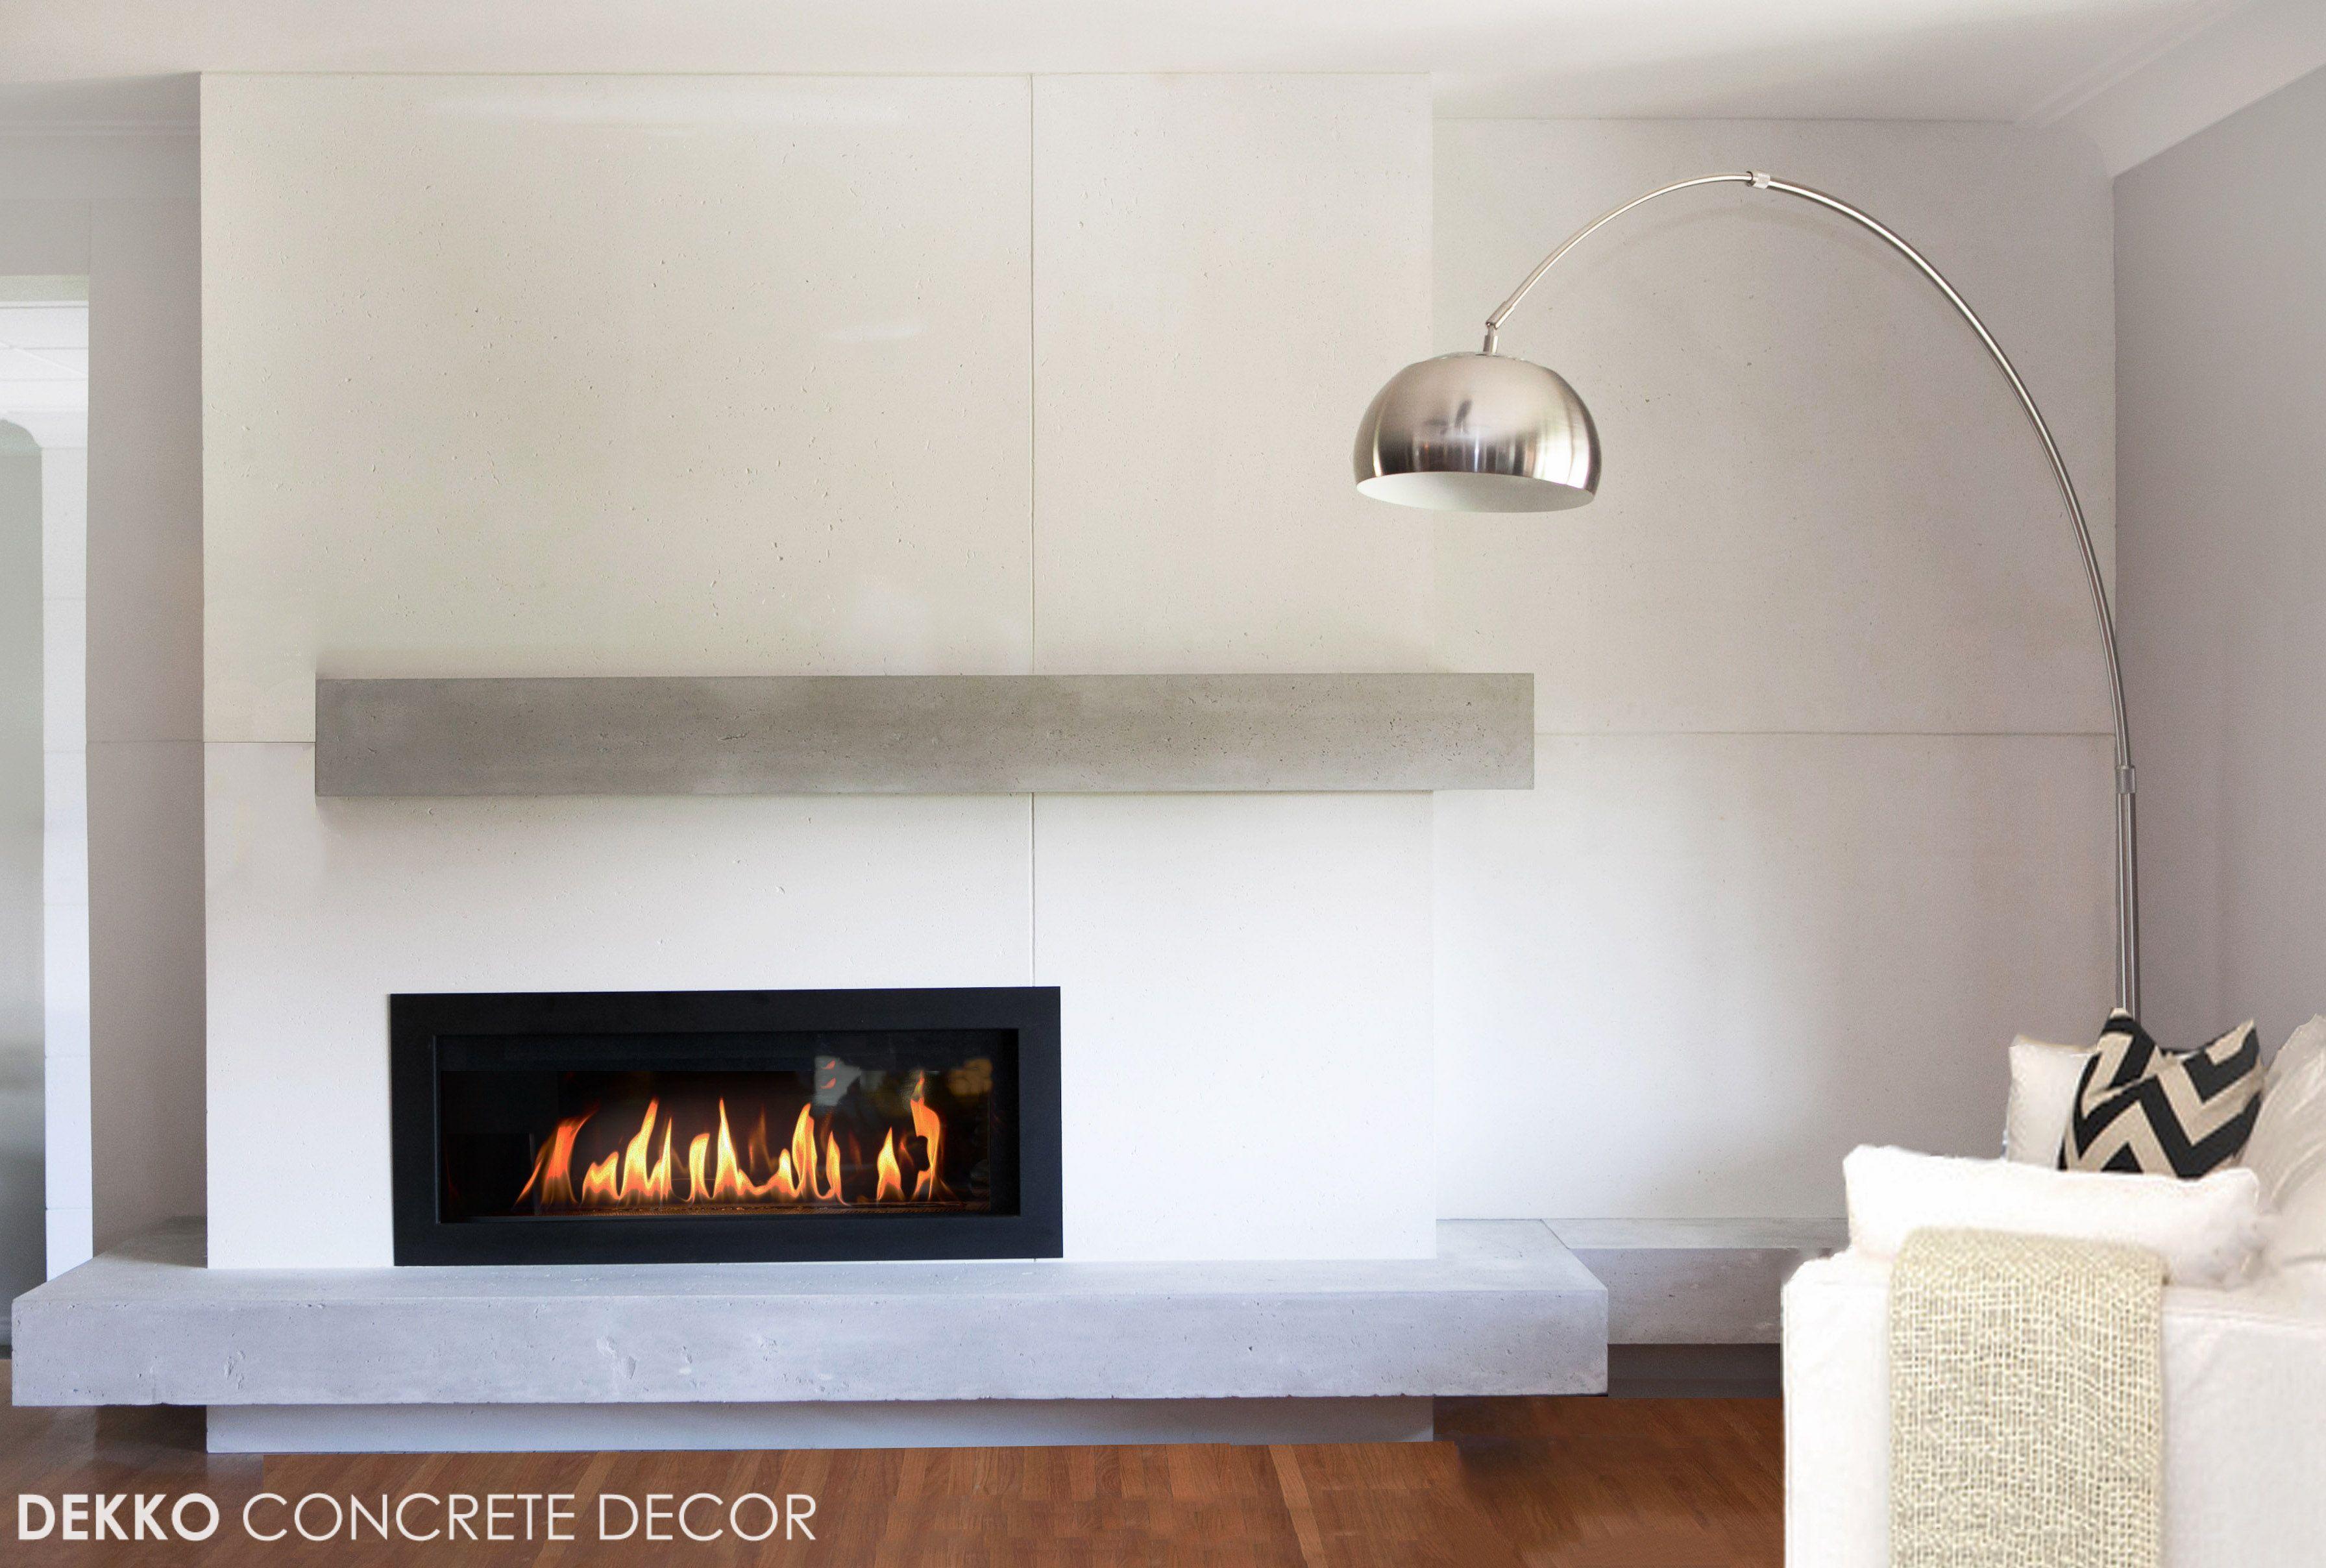 Modern Floating Fireplace Mantel Shelf 3584x2416 Wallpaper Teahub Io